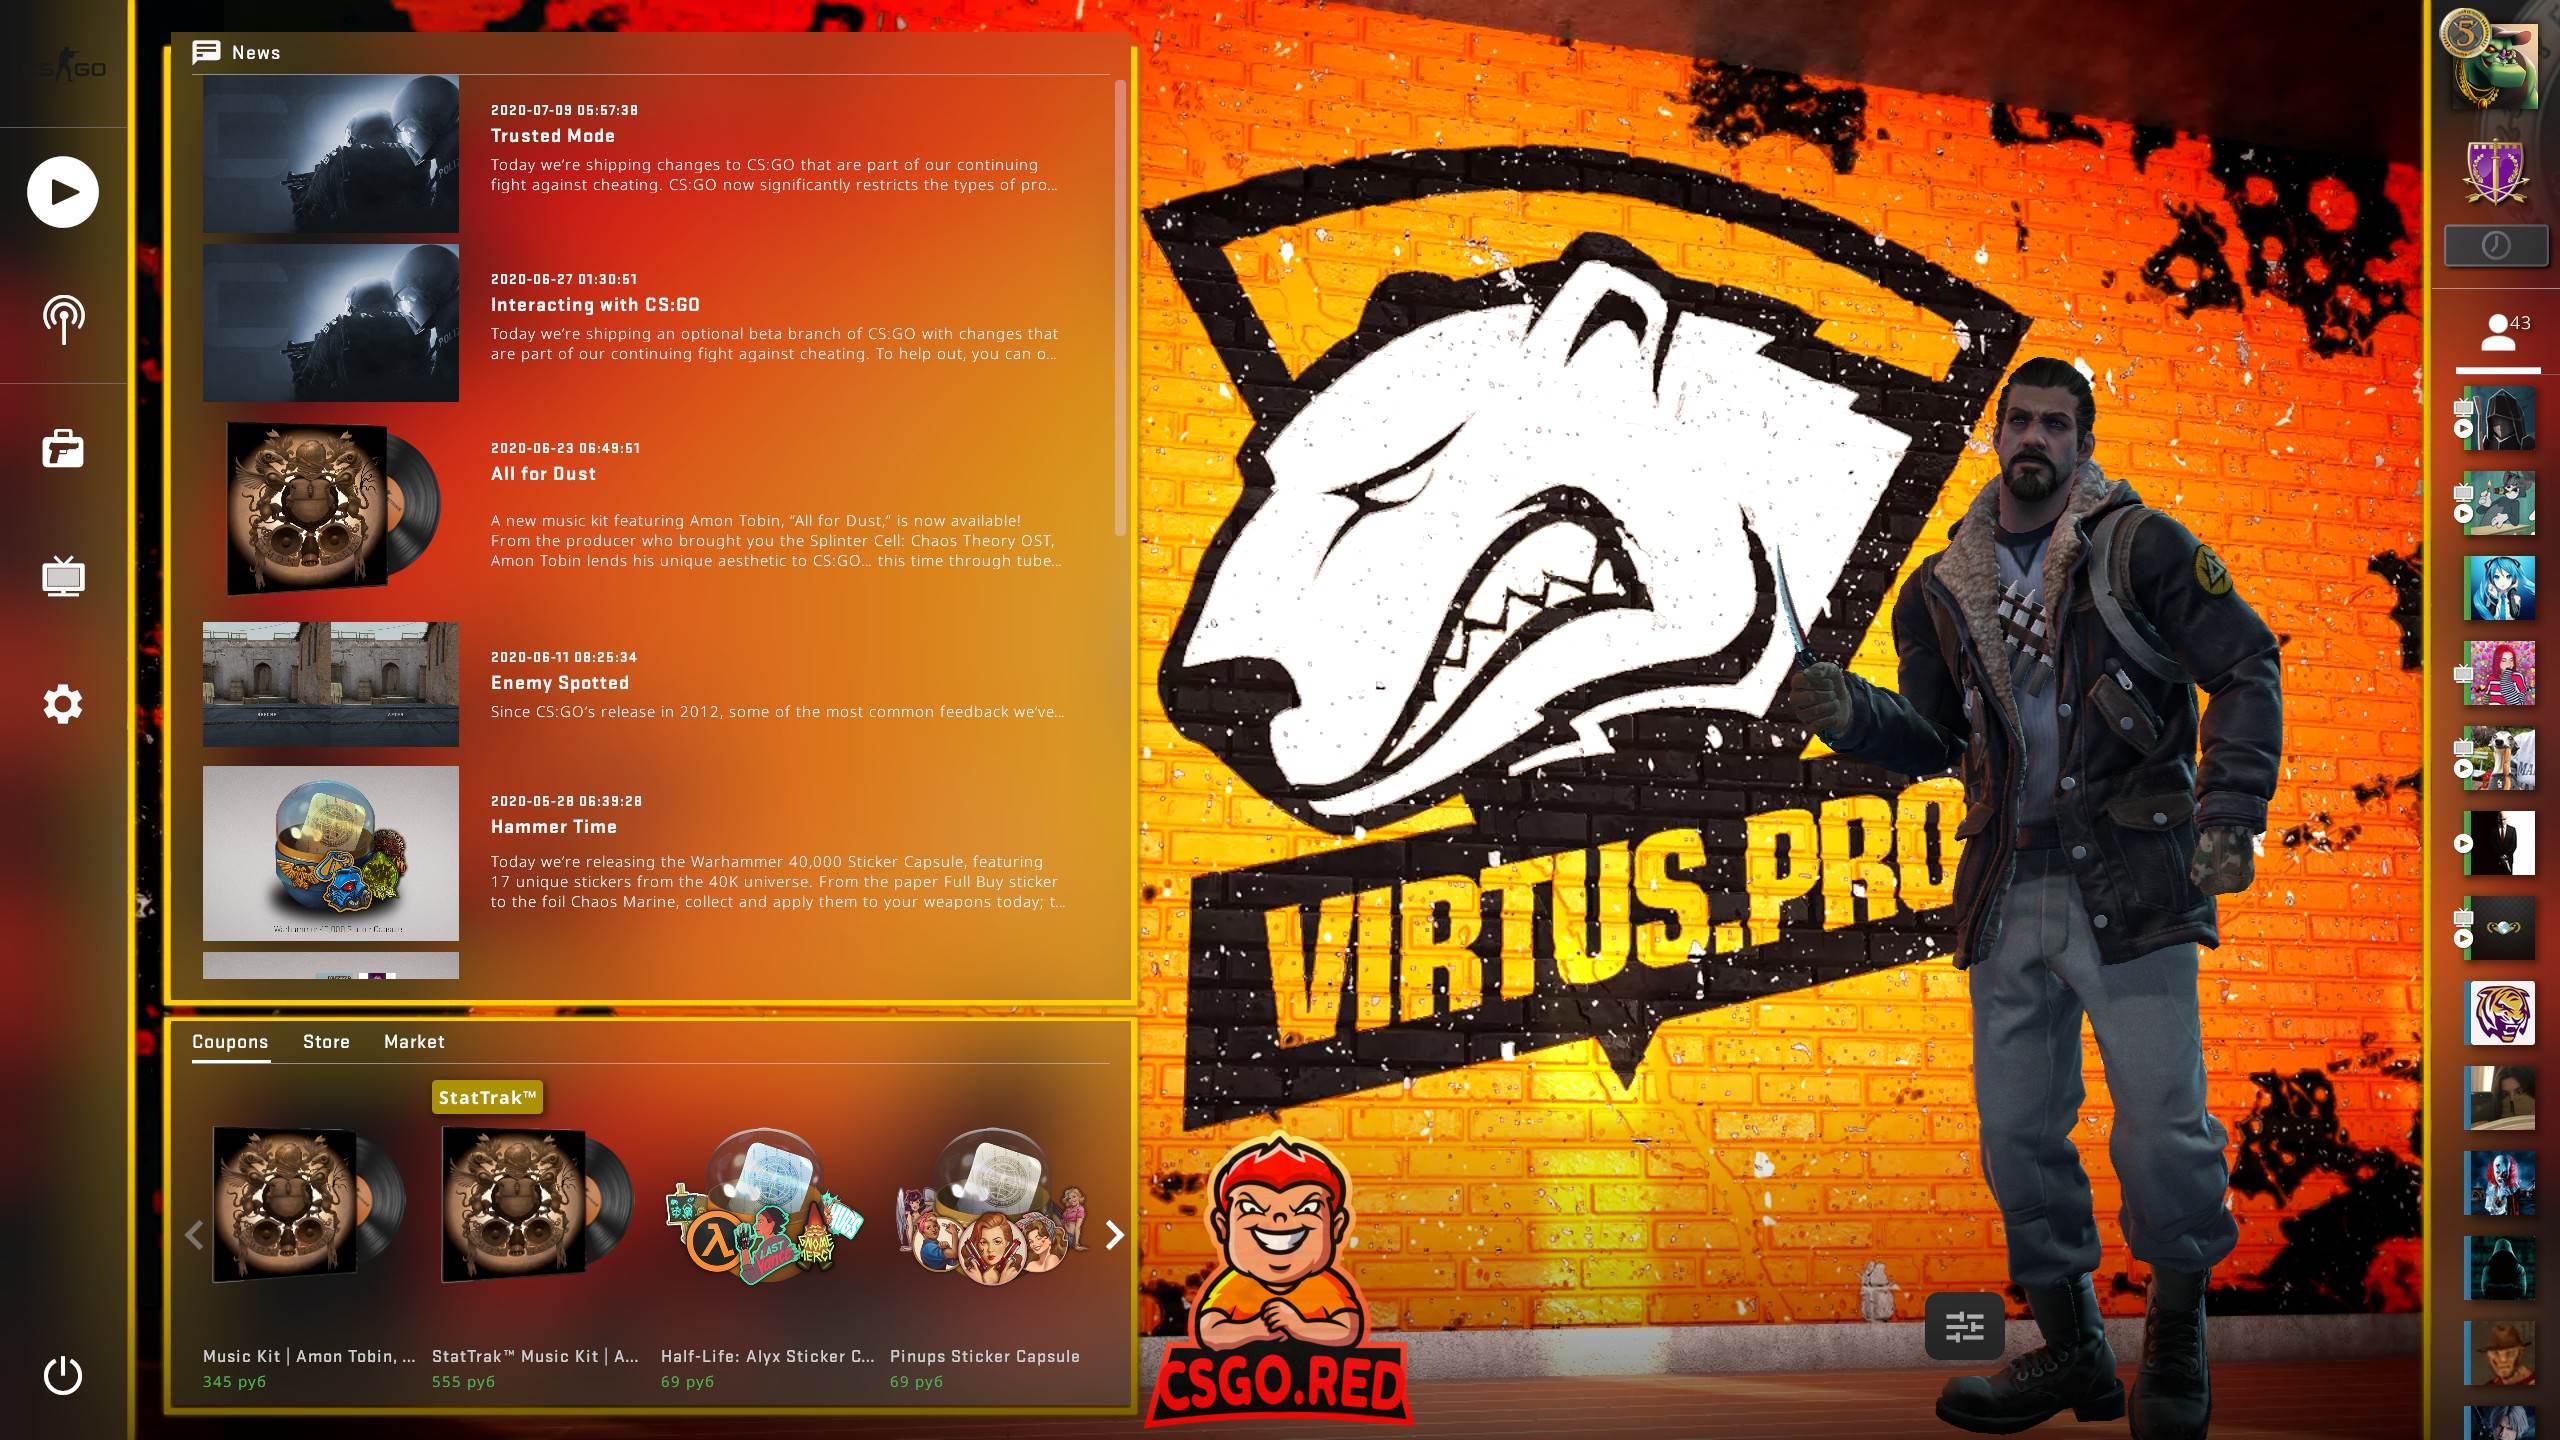 Virtus Pro Panorama UI Background